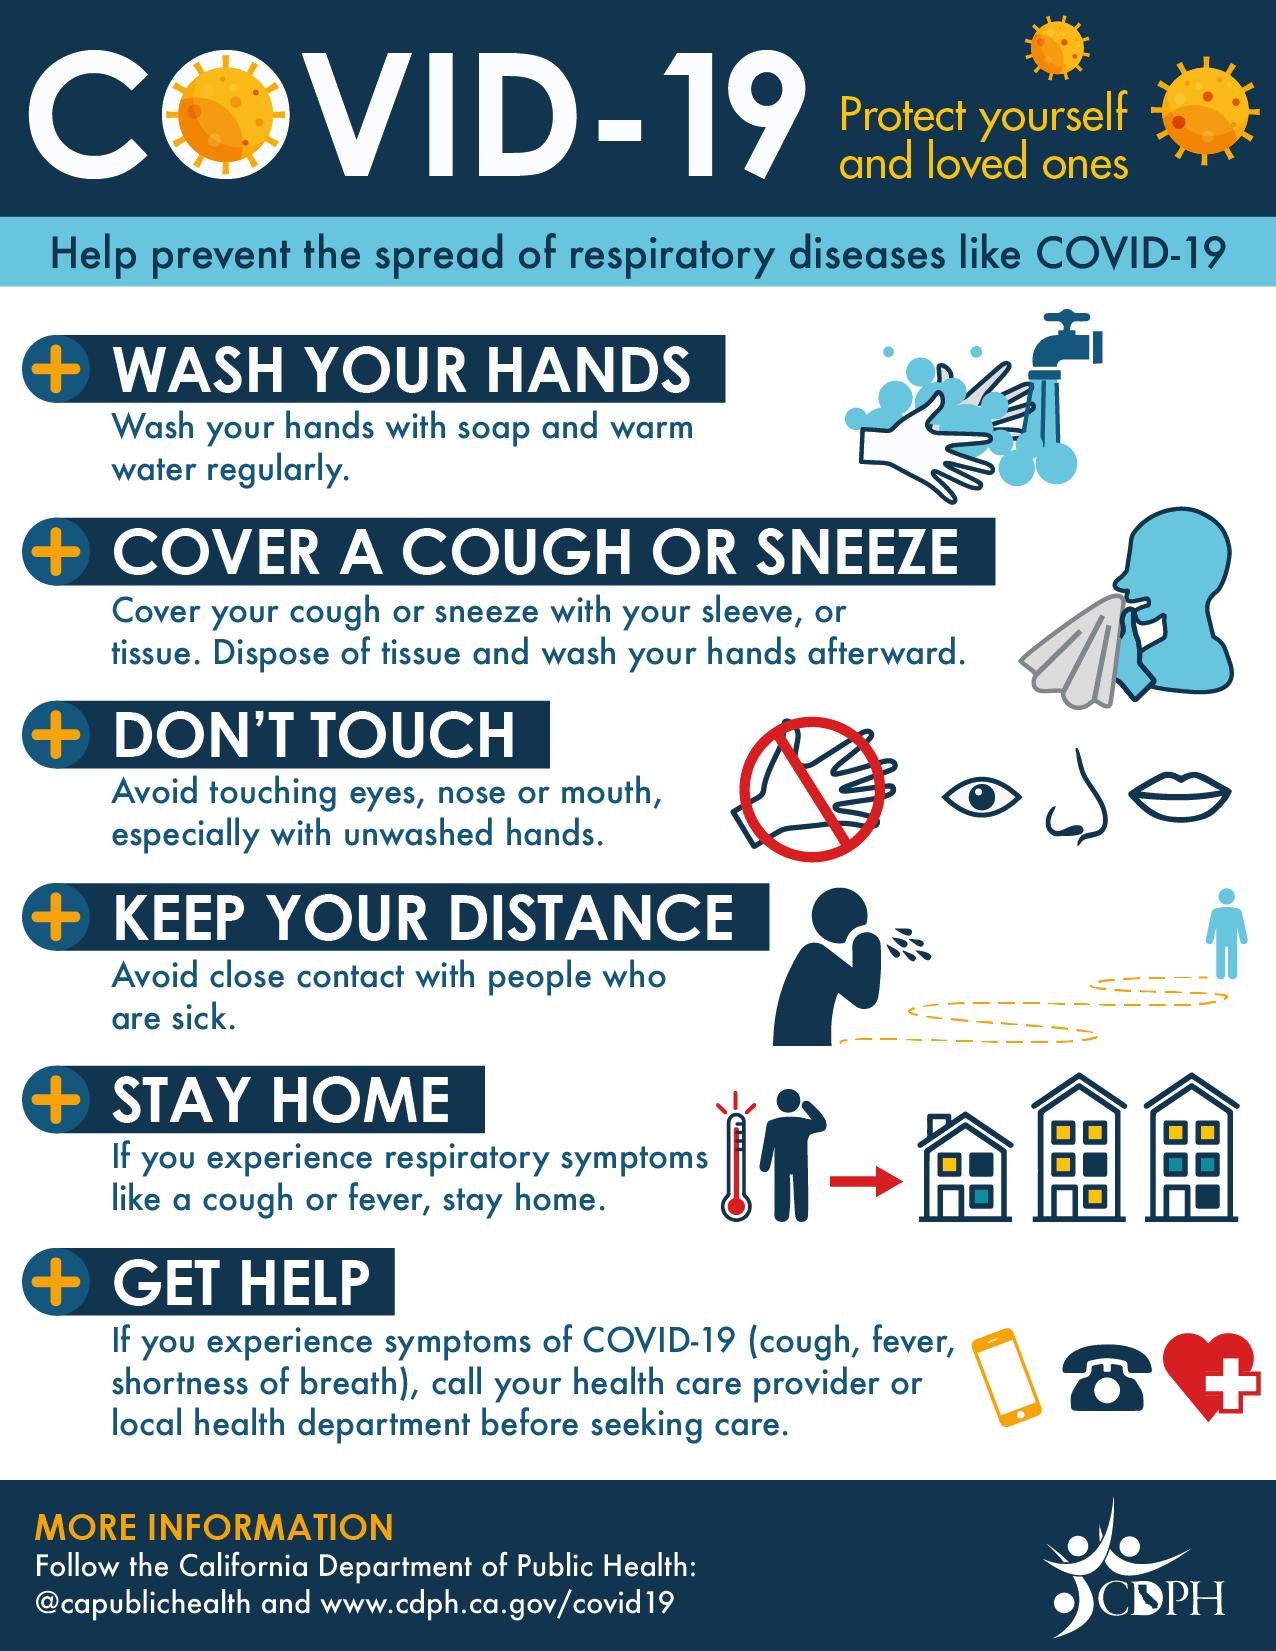 Coronavirus (COVID-19) safety tips